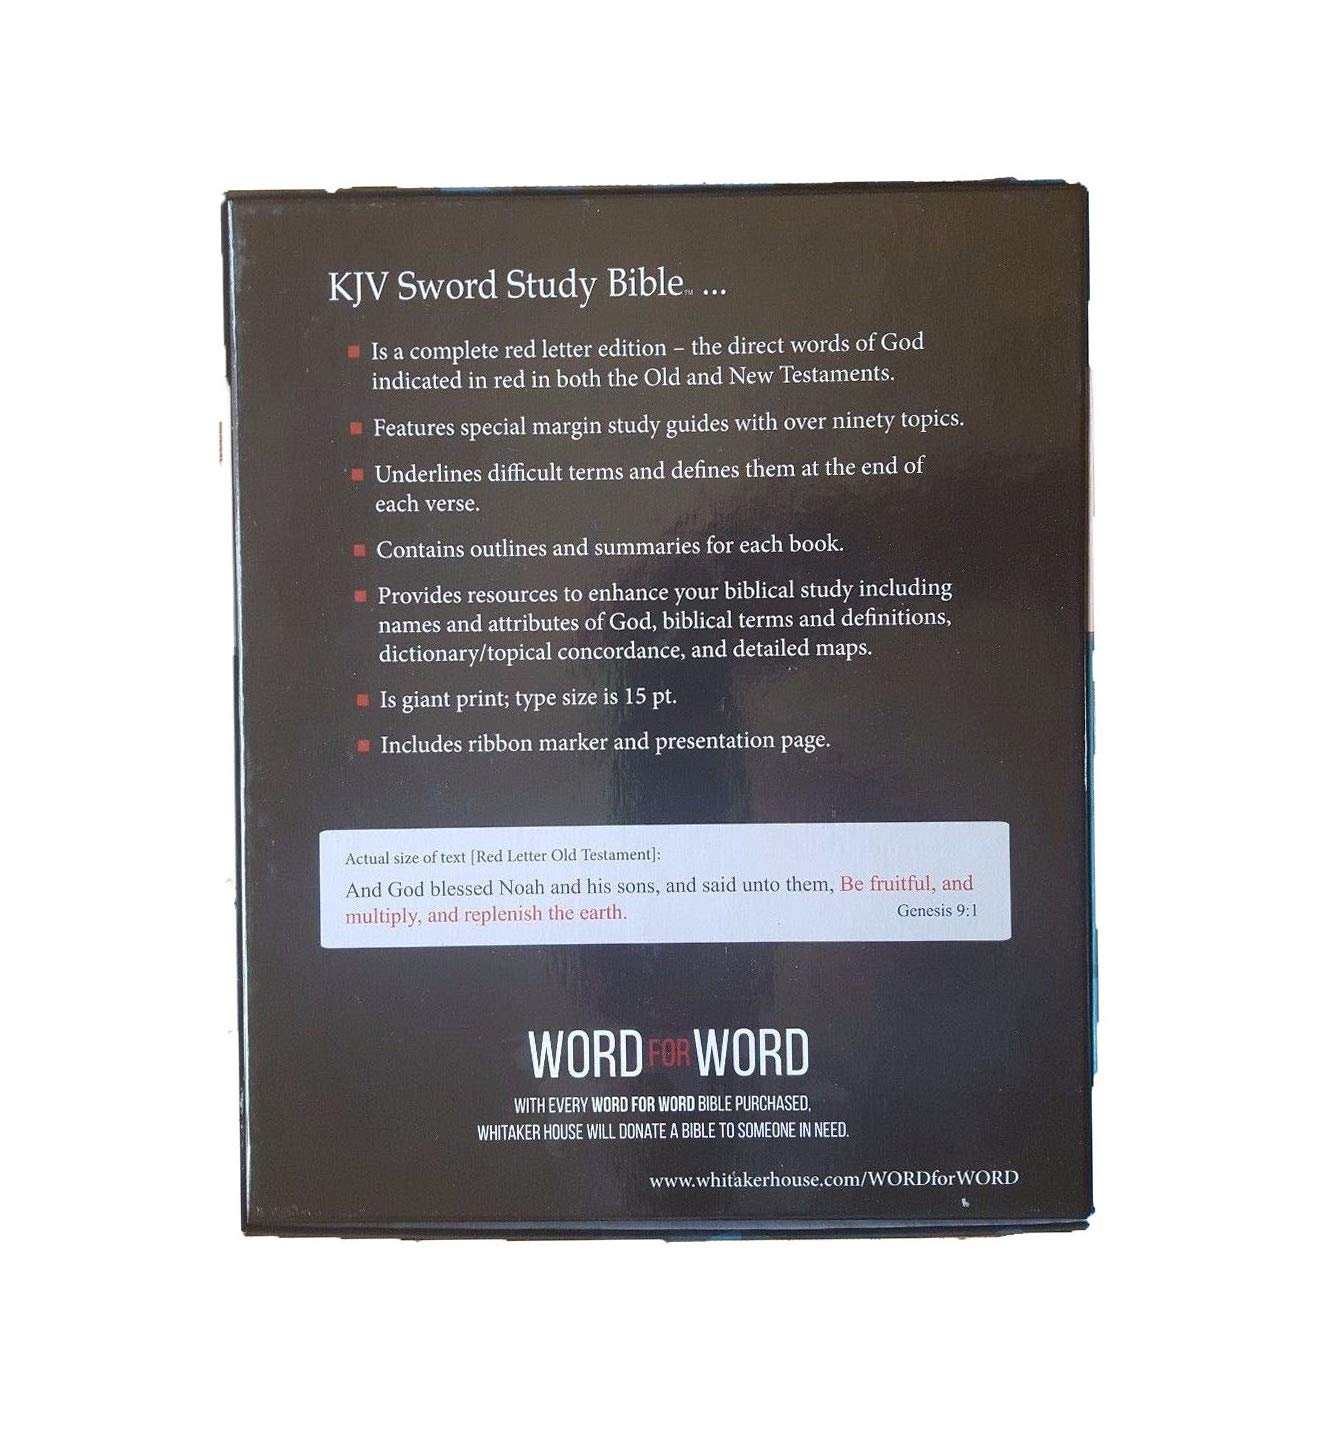 Amazon com: Come On Style Shop The Giant Print KJV Sword Study Bible